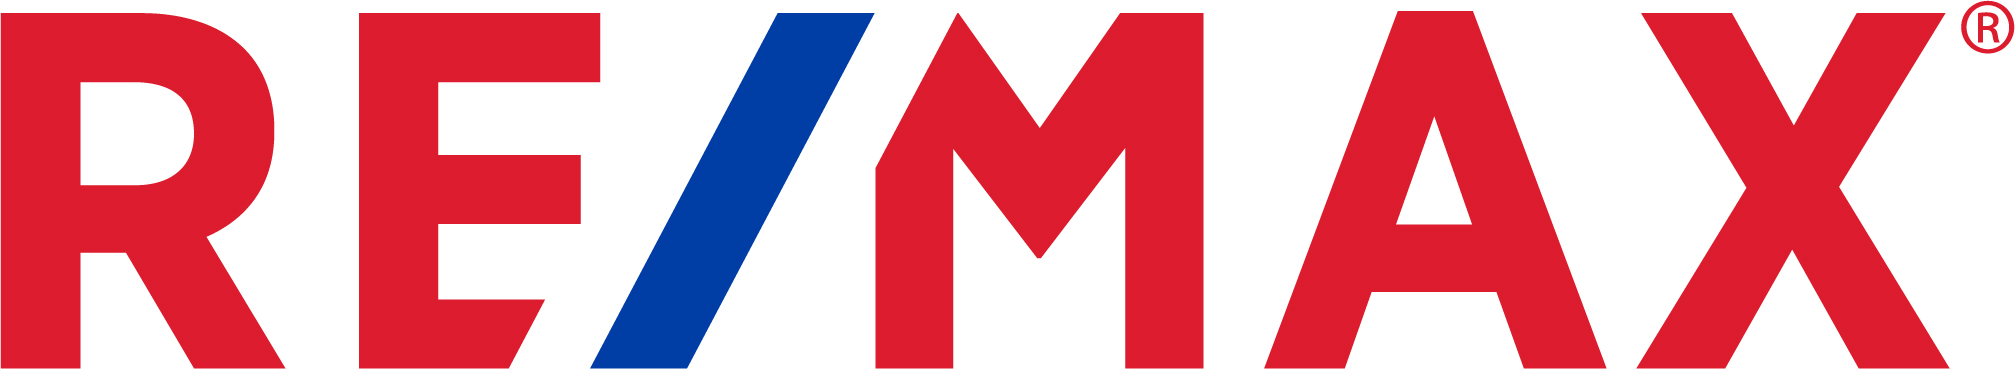 Remax Edge logo